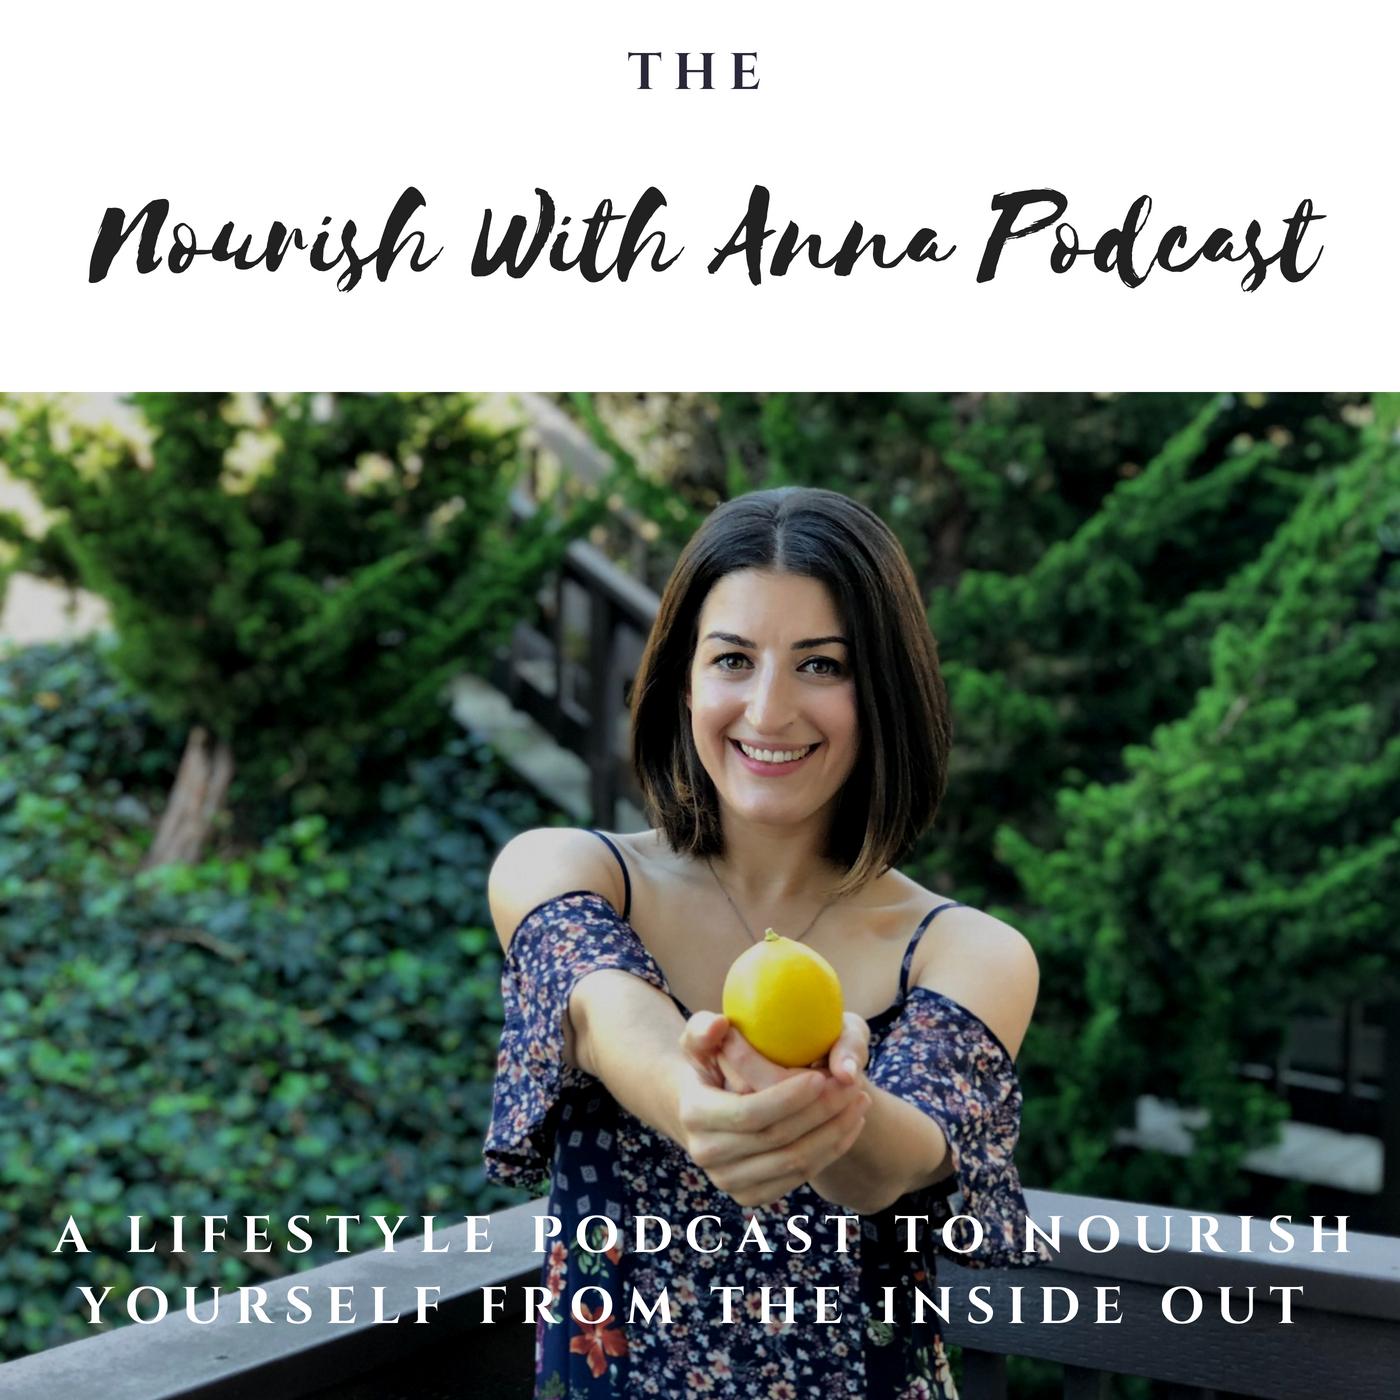 Nourish with Anna Podcast Image. .jpg